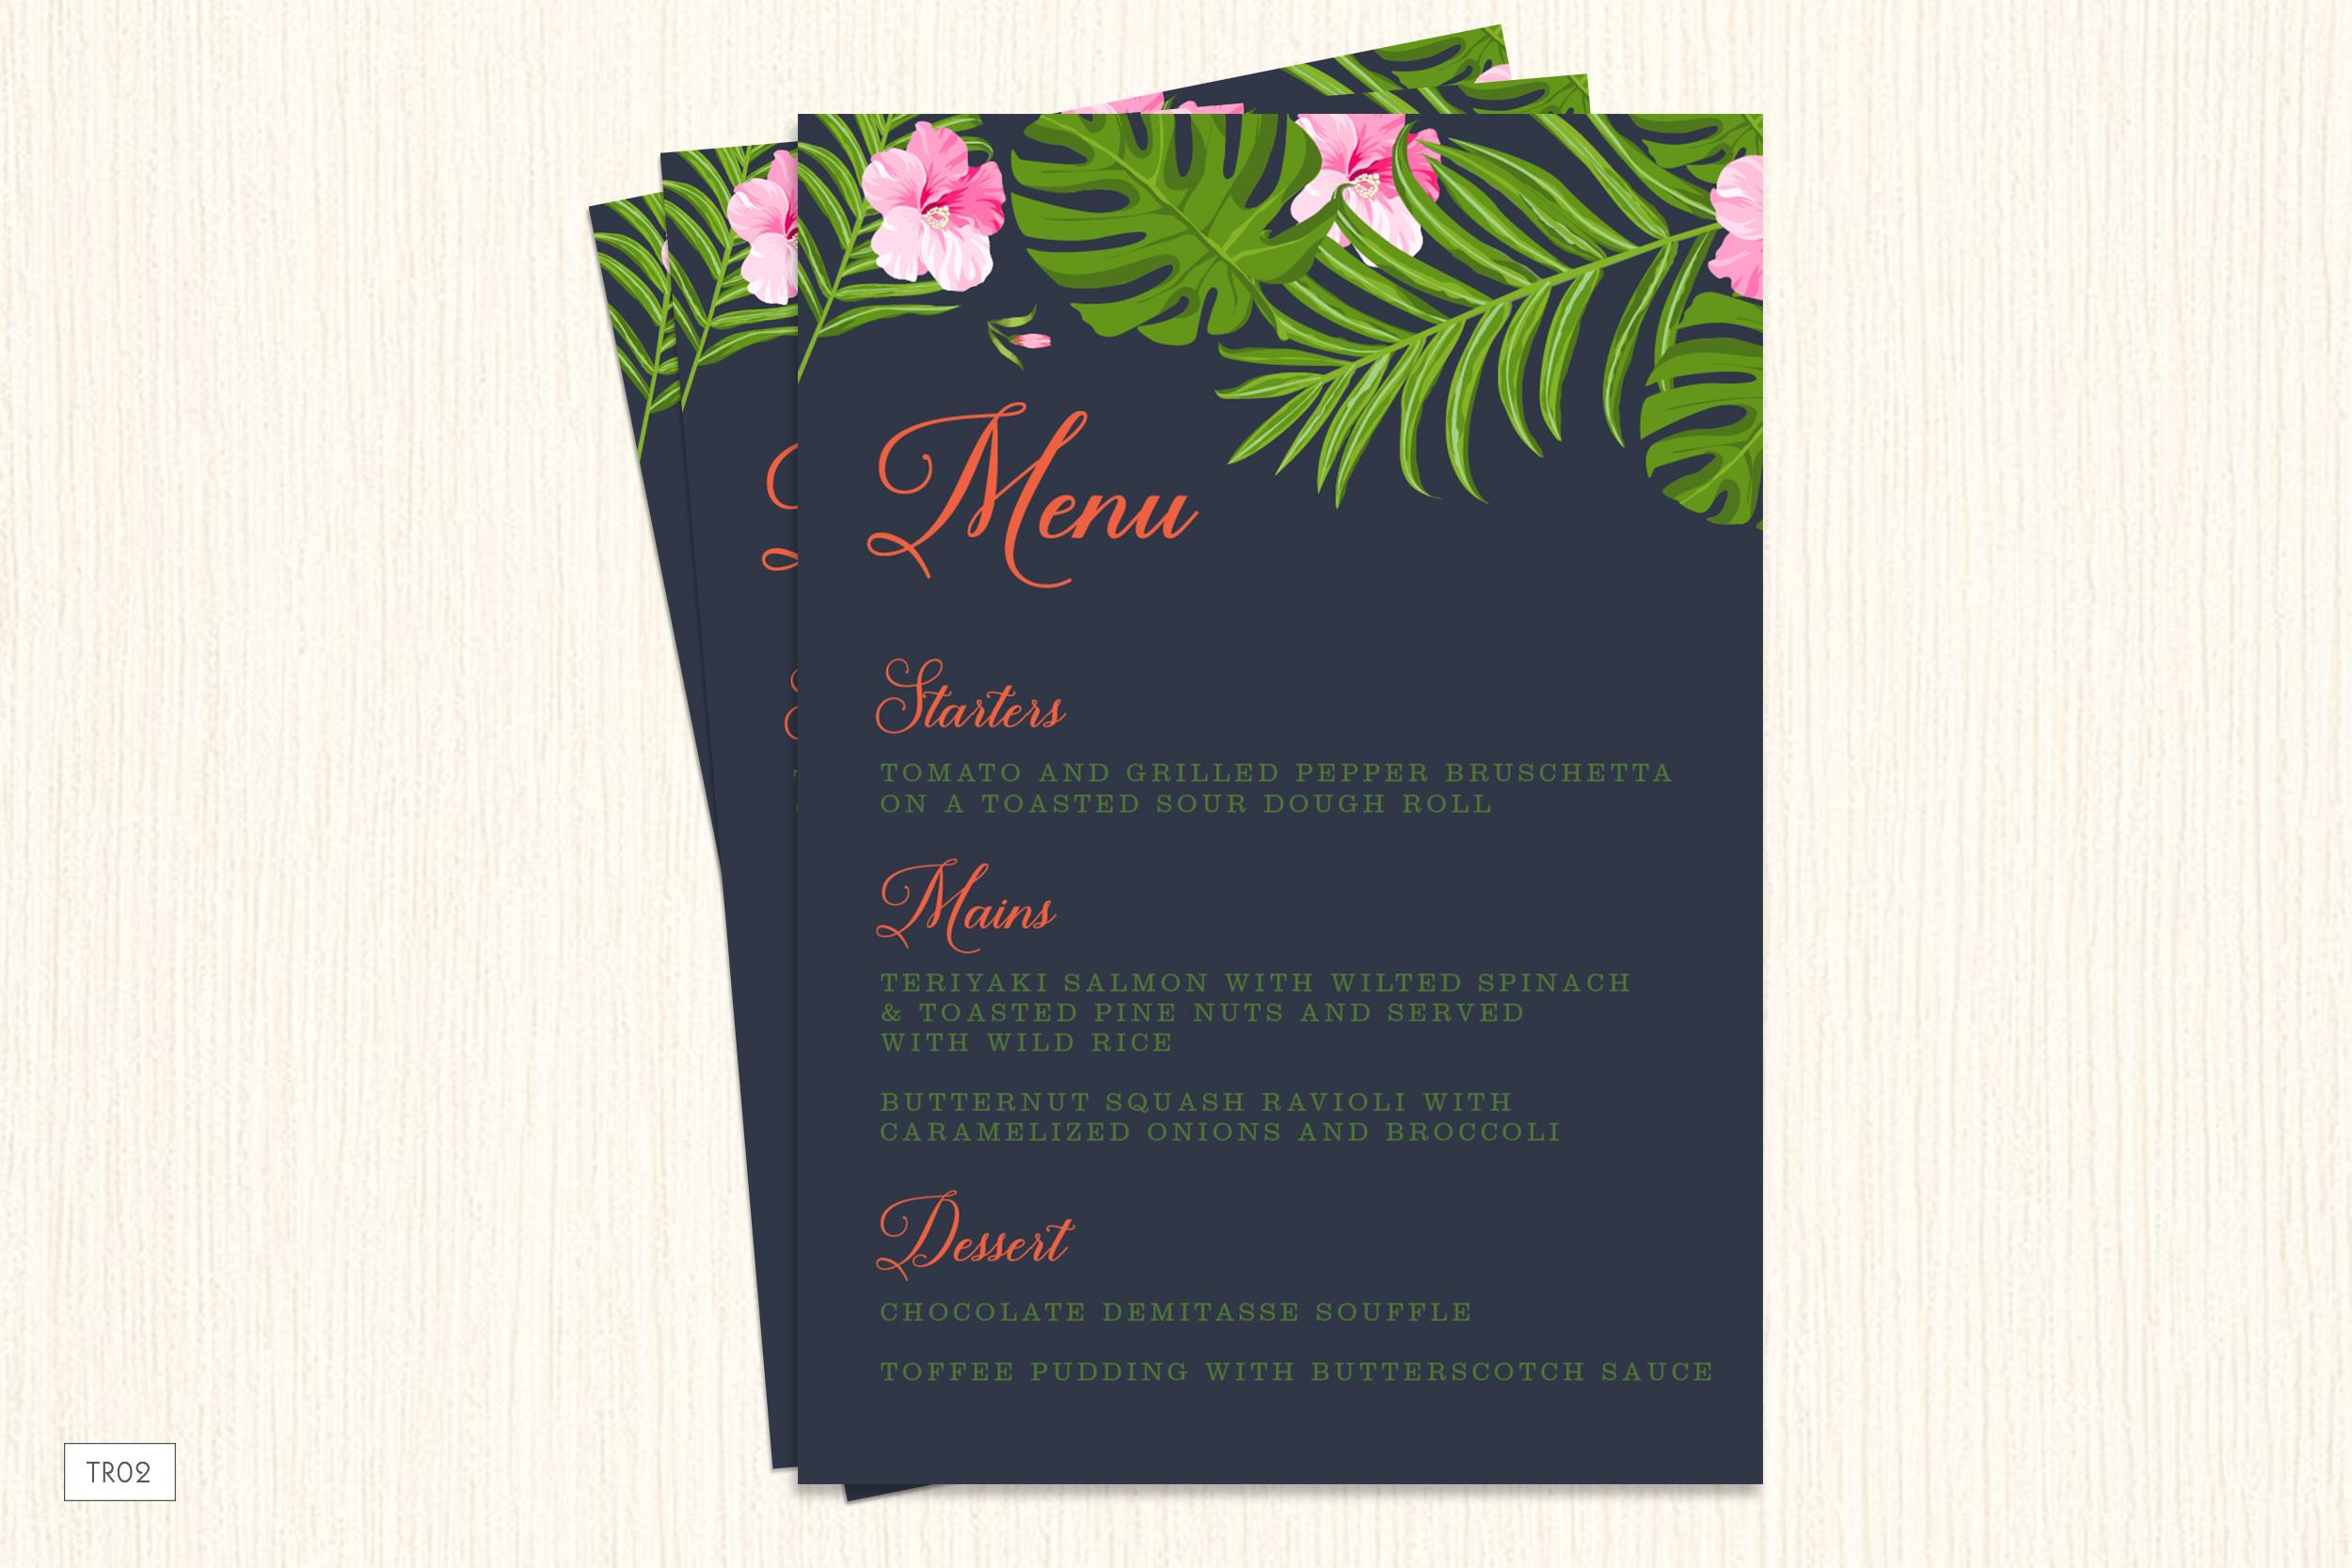 tr02-tropics-menu-wedding-invitation.jpg